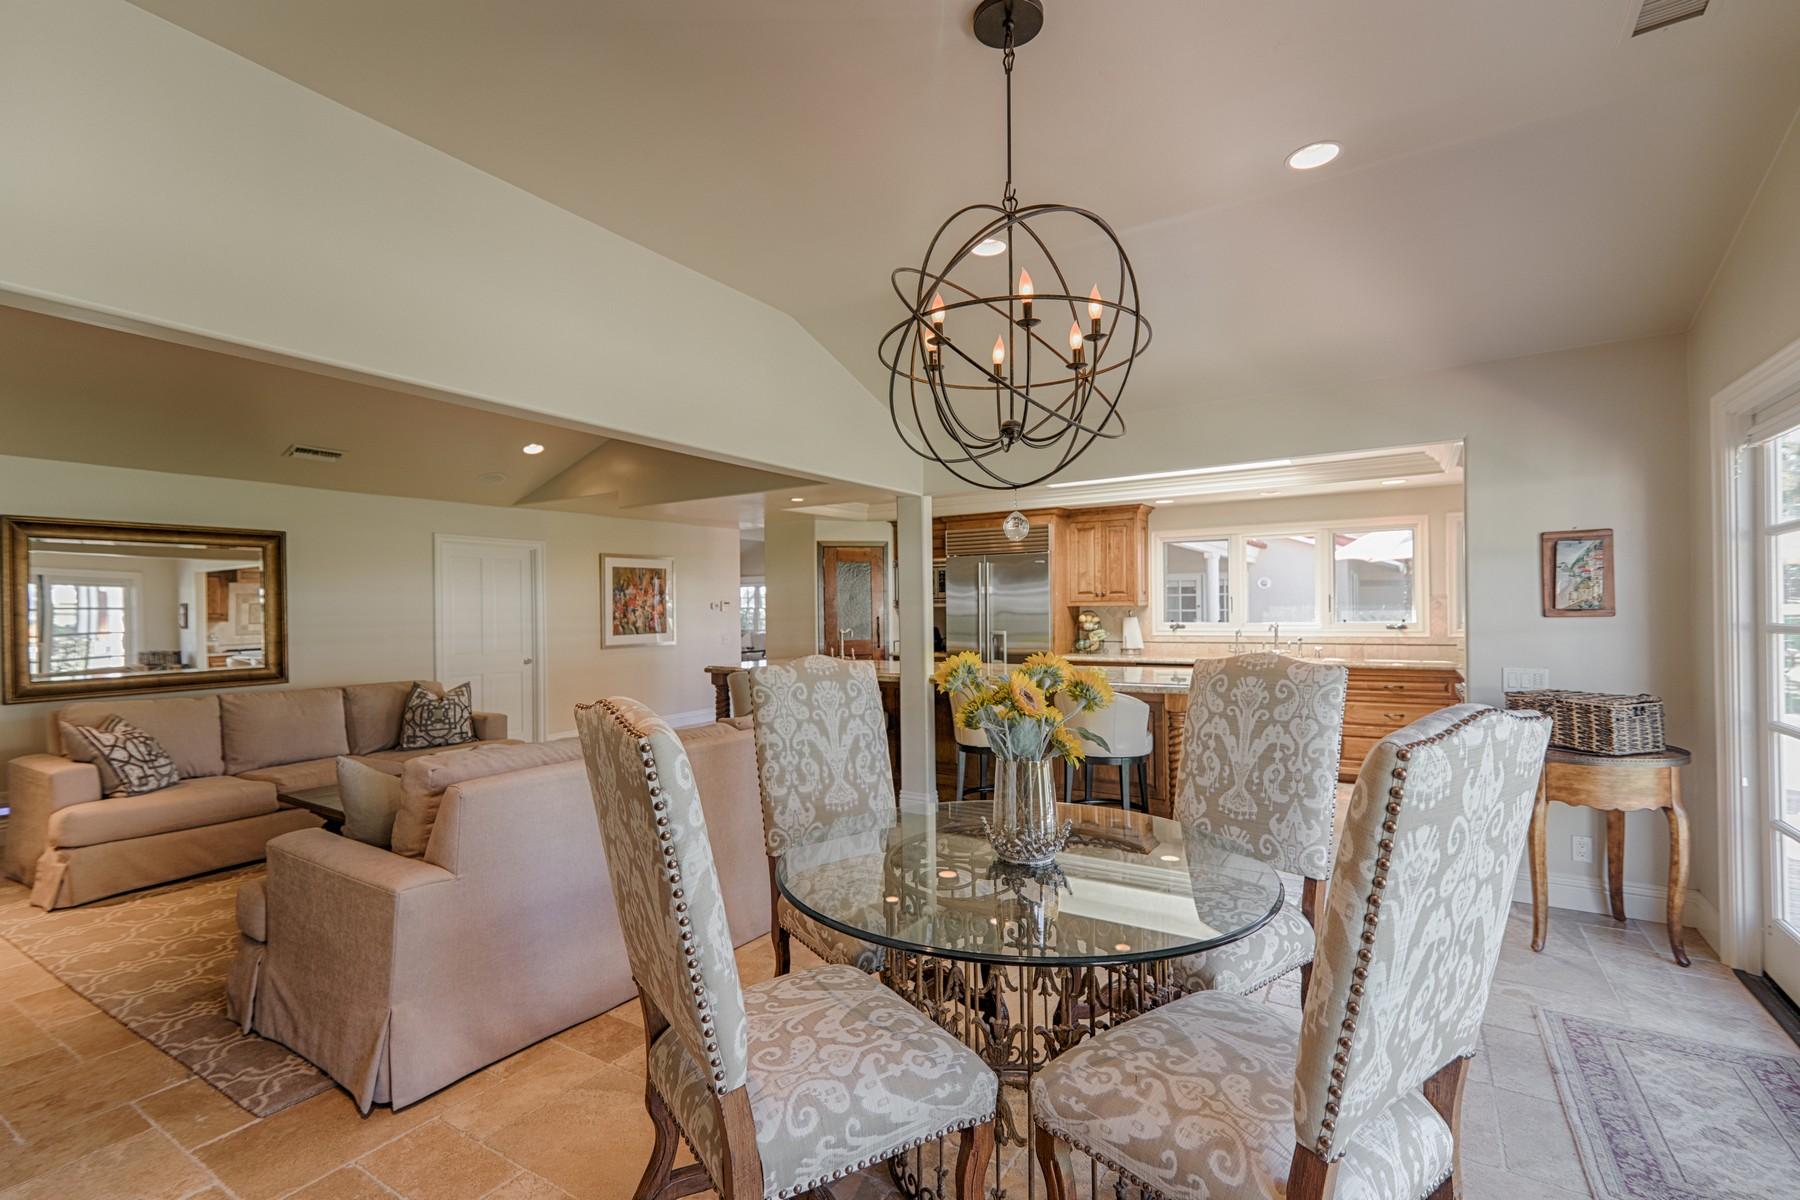 Additional photo for property listing at 6458 El Sicomoro  Rancho Santa Fe, California 92067 United States